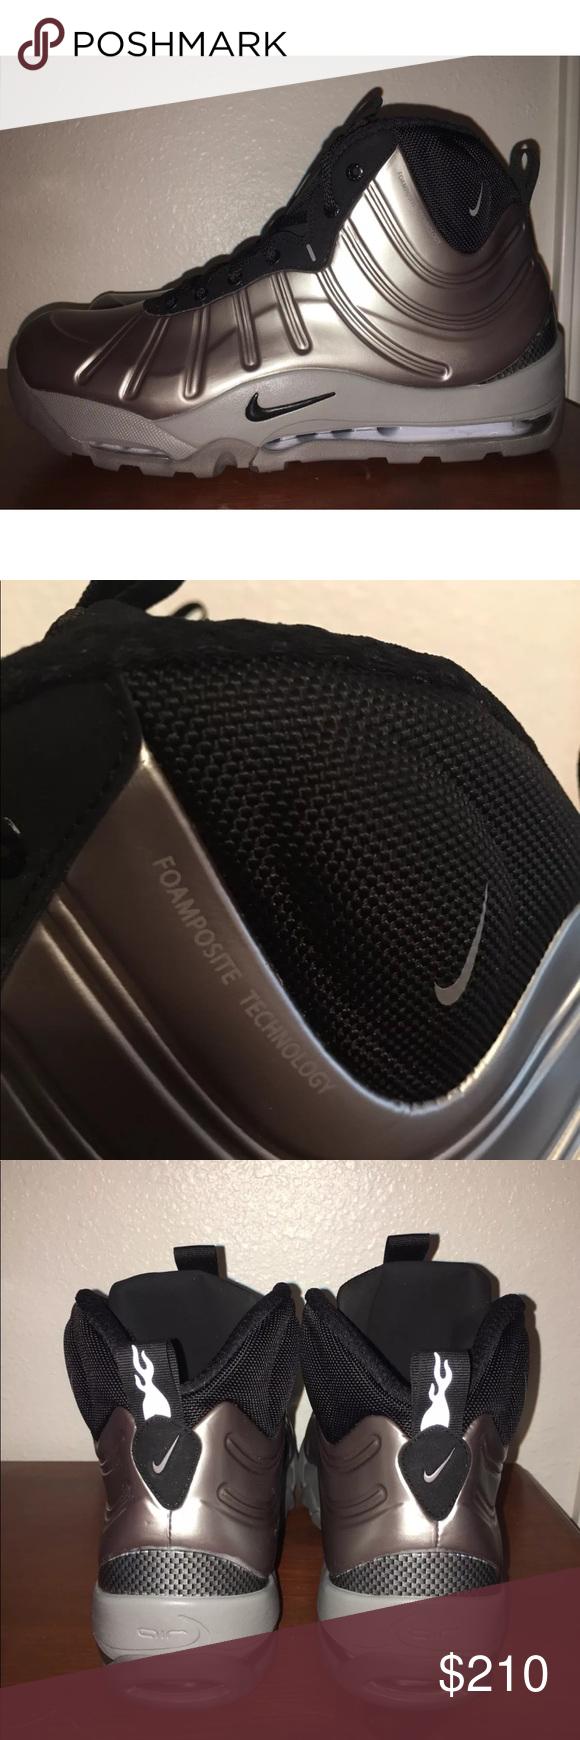 Posite Size Air Brand New Metallic Pewter Bakin 11 Nike Boot wUTqOOE